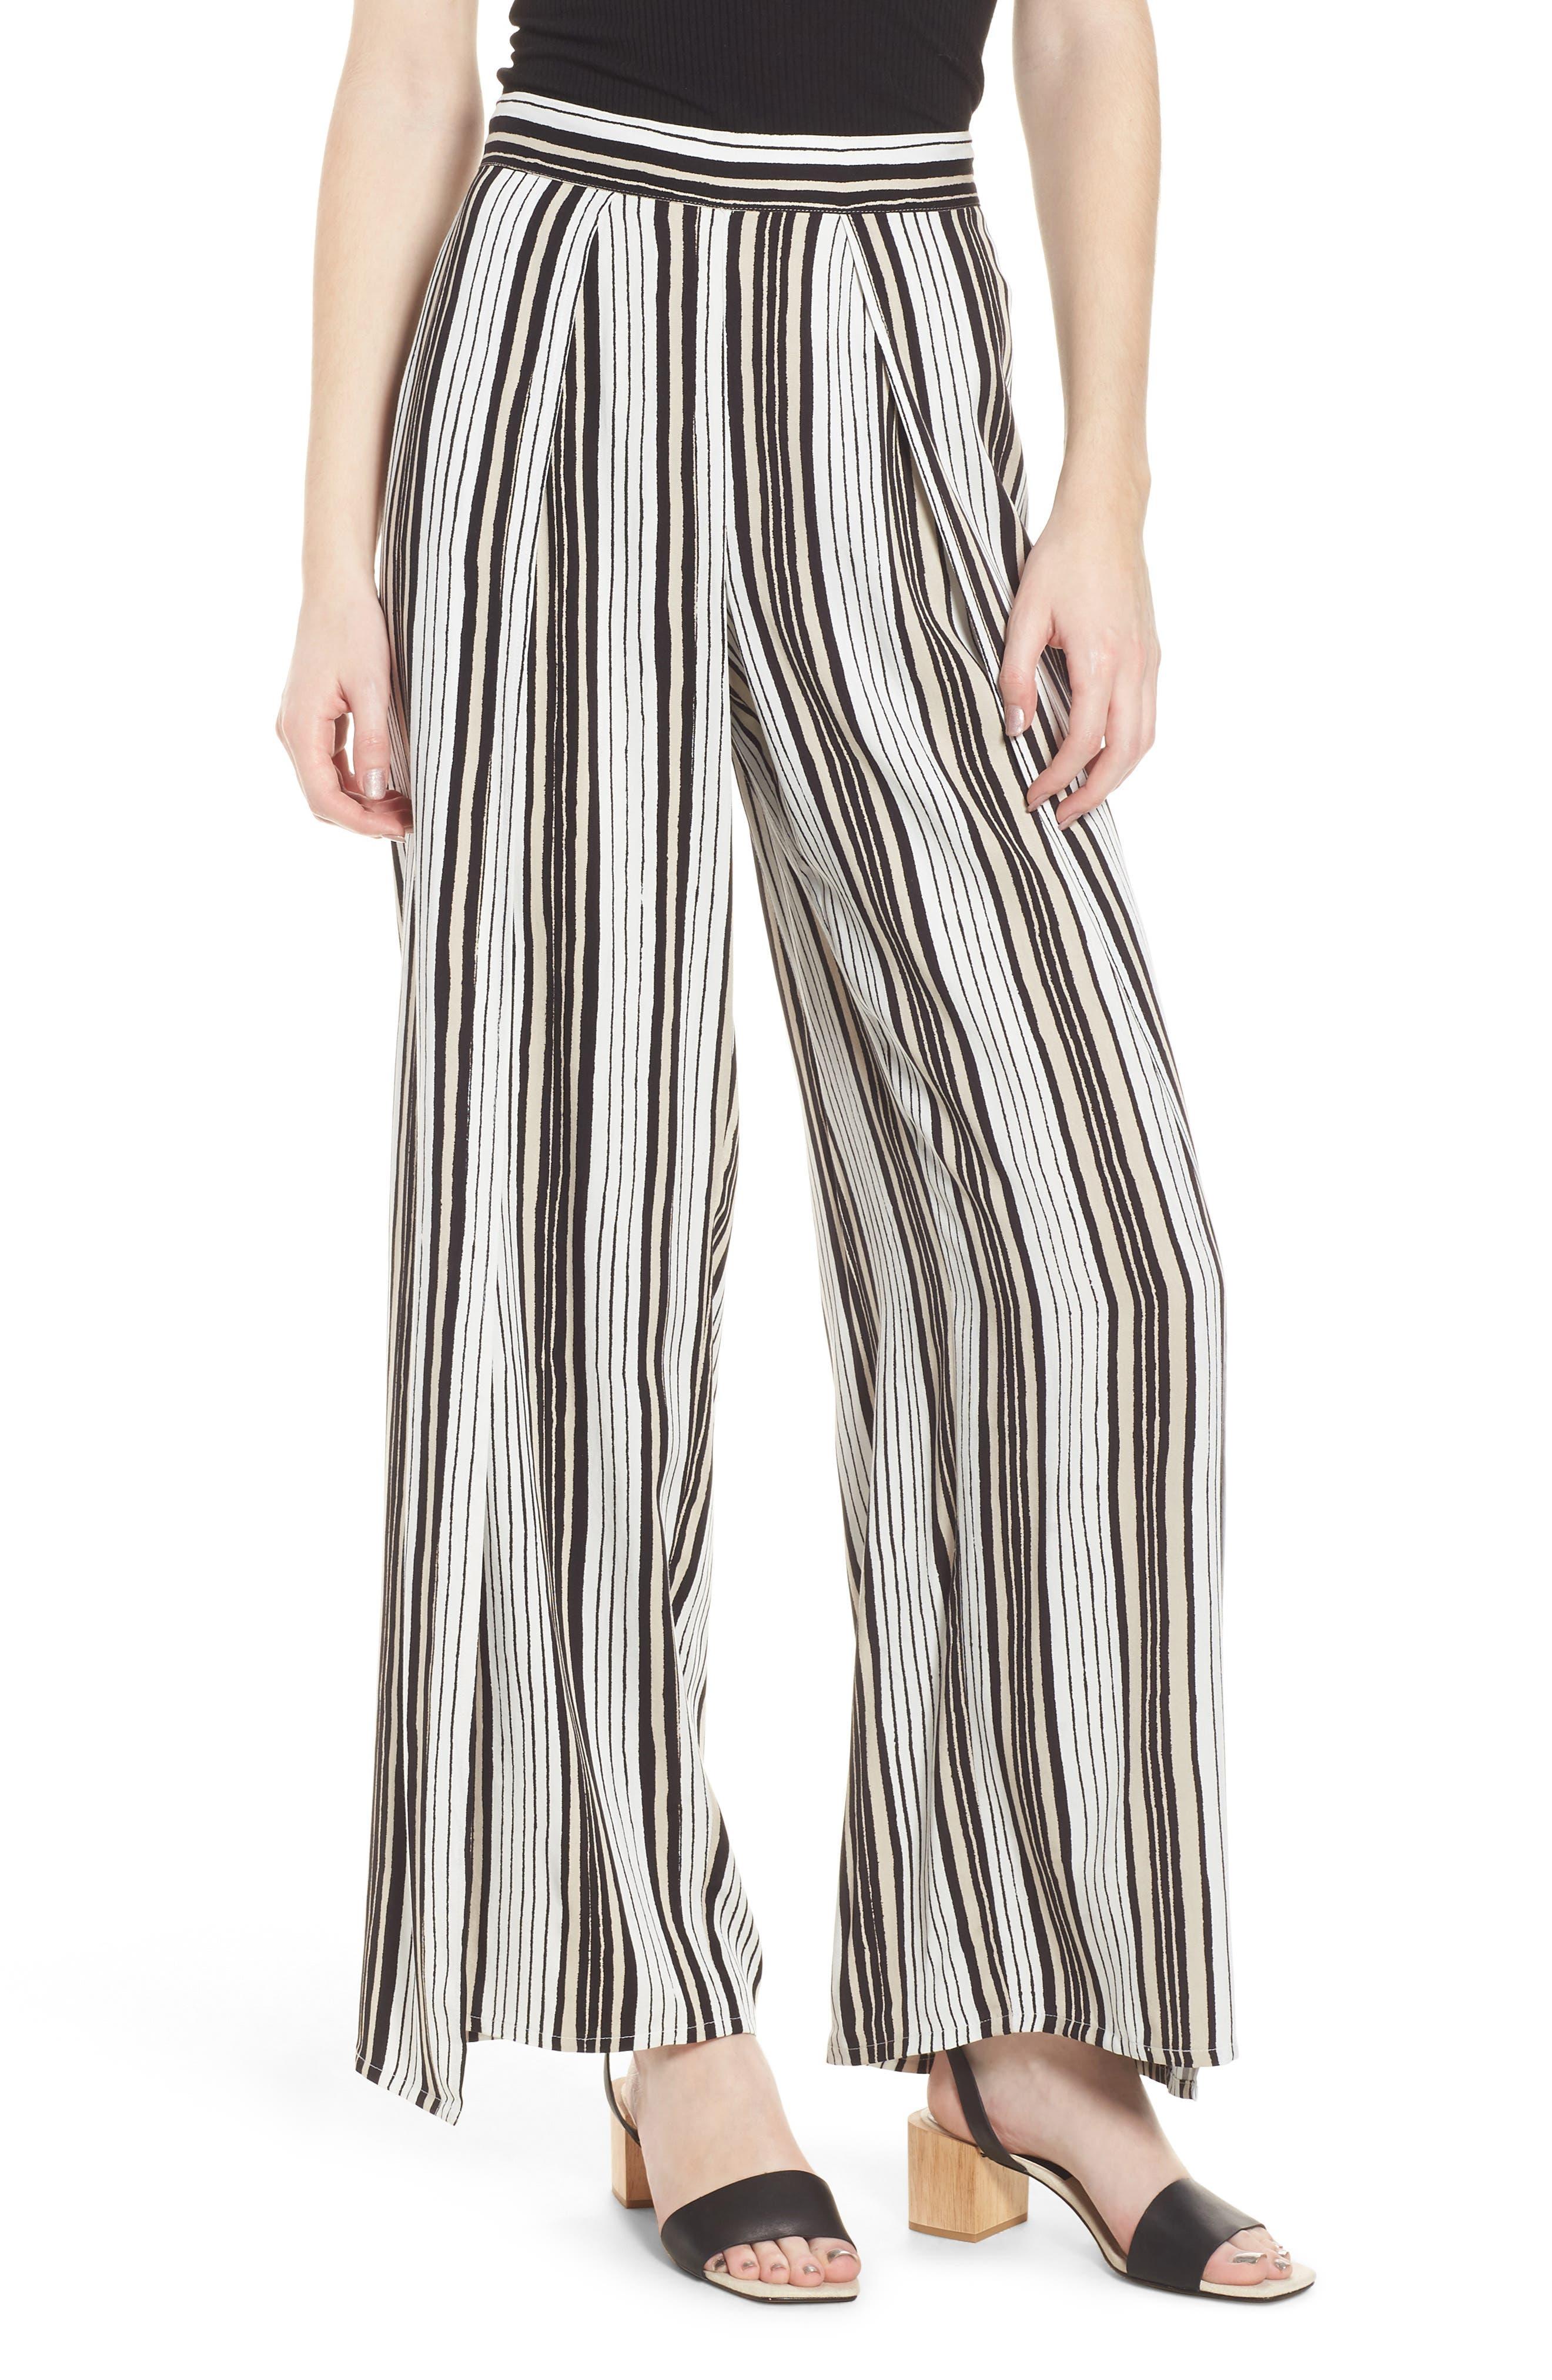 Avah Stripe Pants,                             Main thumbnail 1, color,                             Ivory